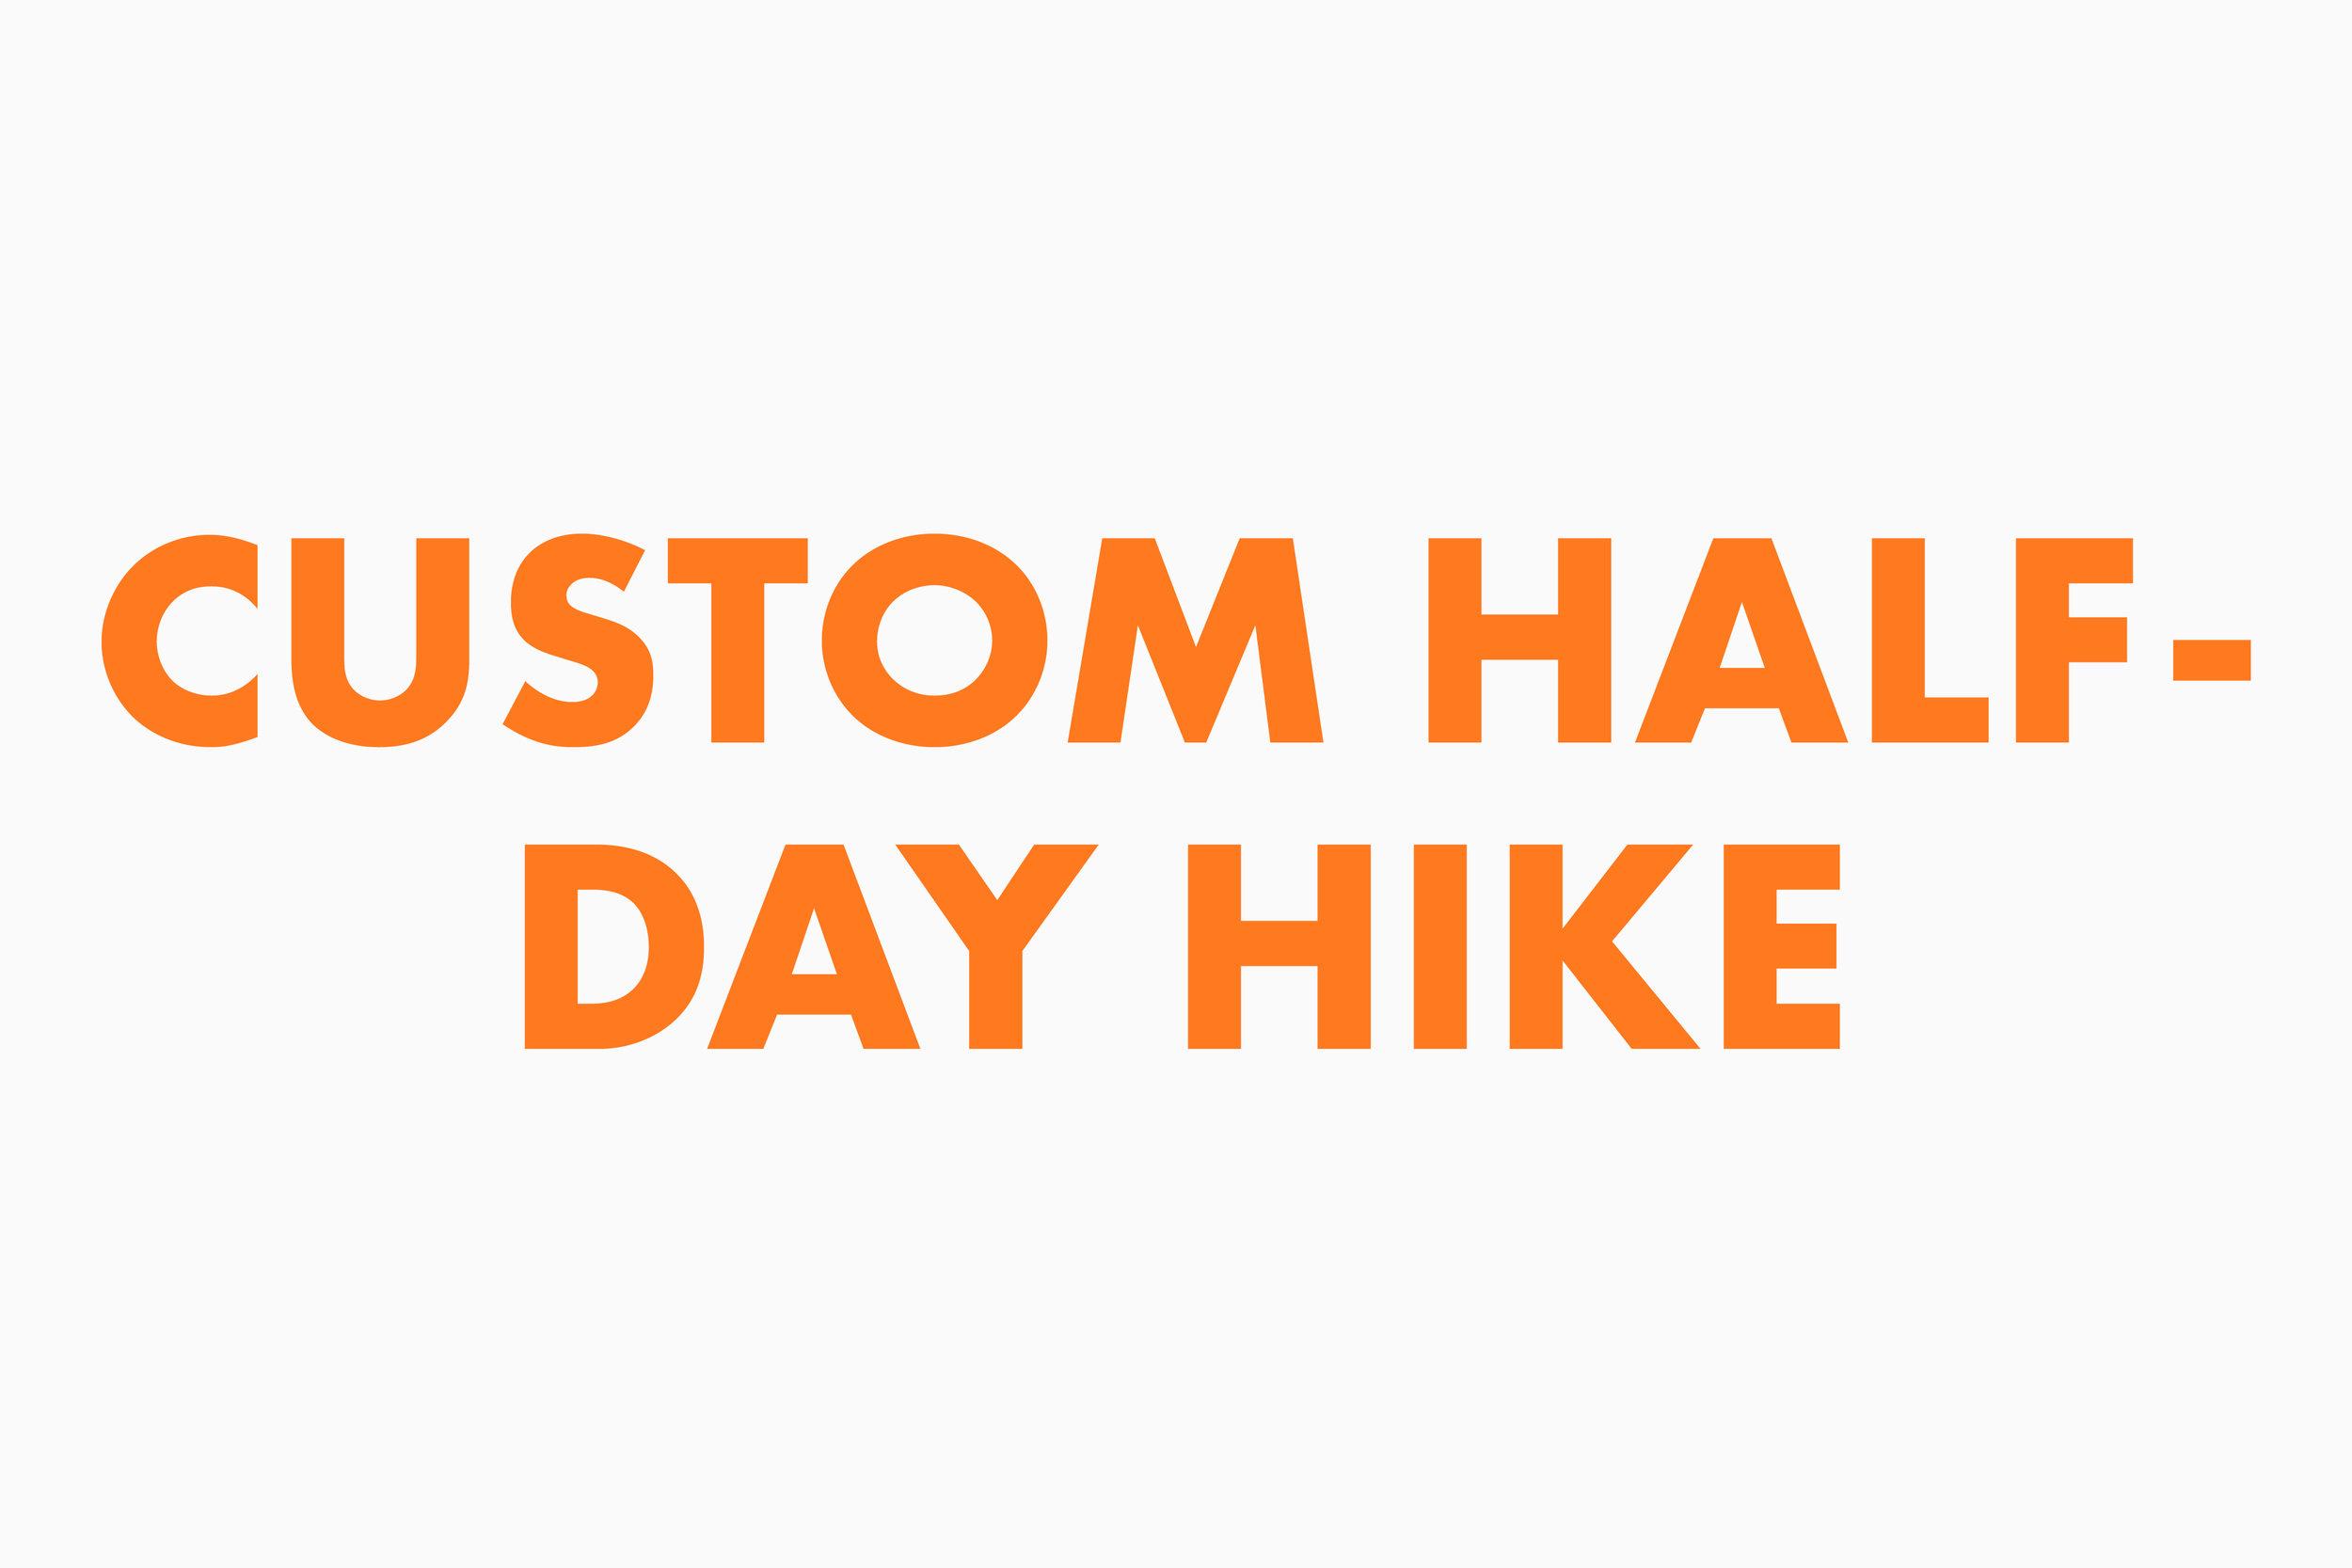 custom_half_day_hike.jpg